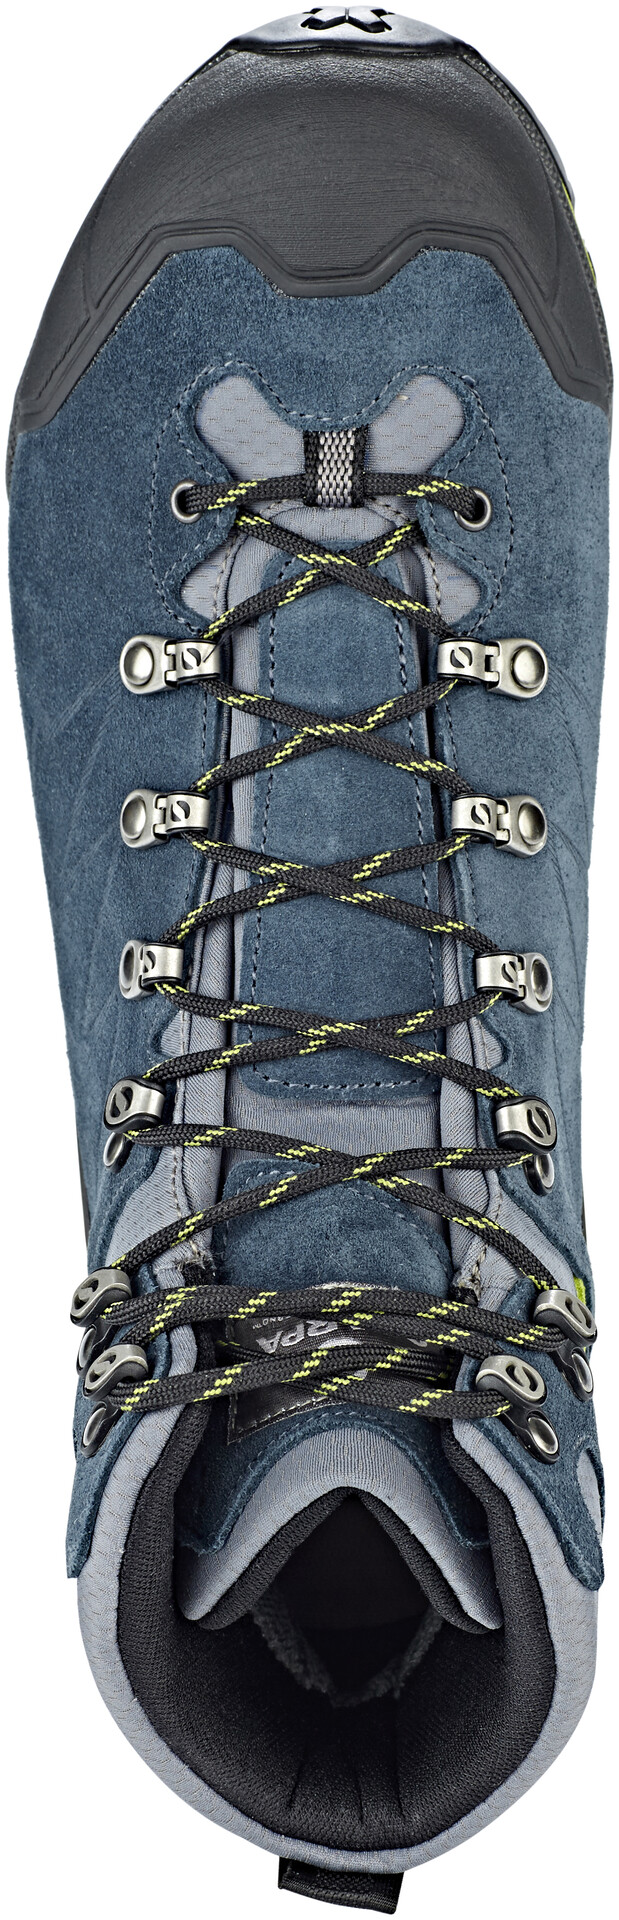 Ottaniospring Shoes Scarpa Men Zg Gtx Trek 54RcAjq3L